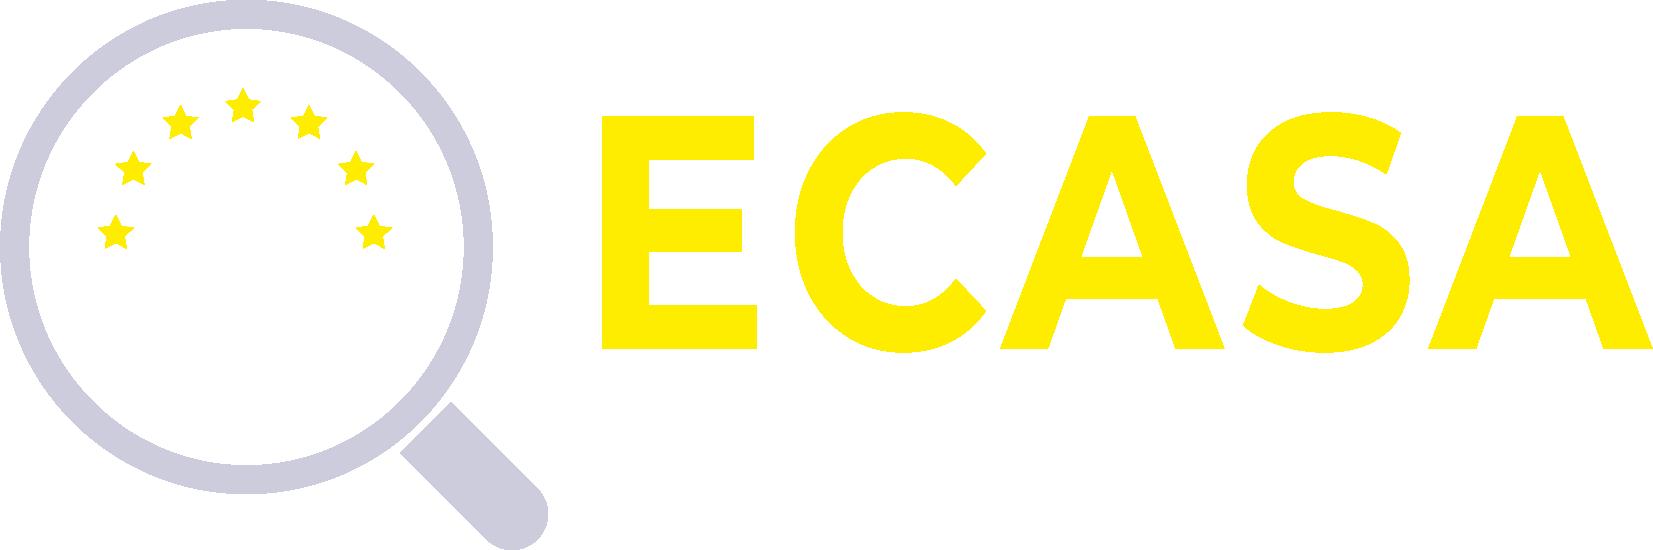 European CAse Study Alliance